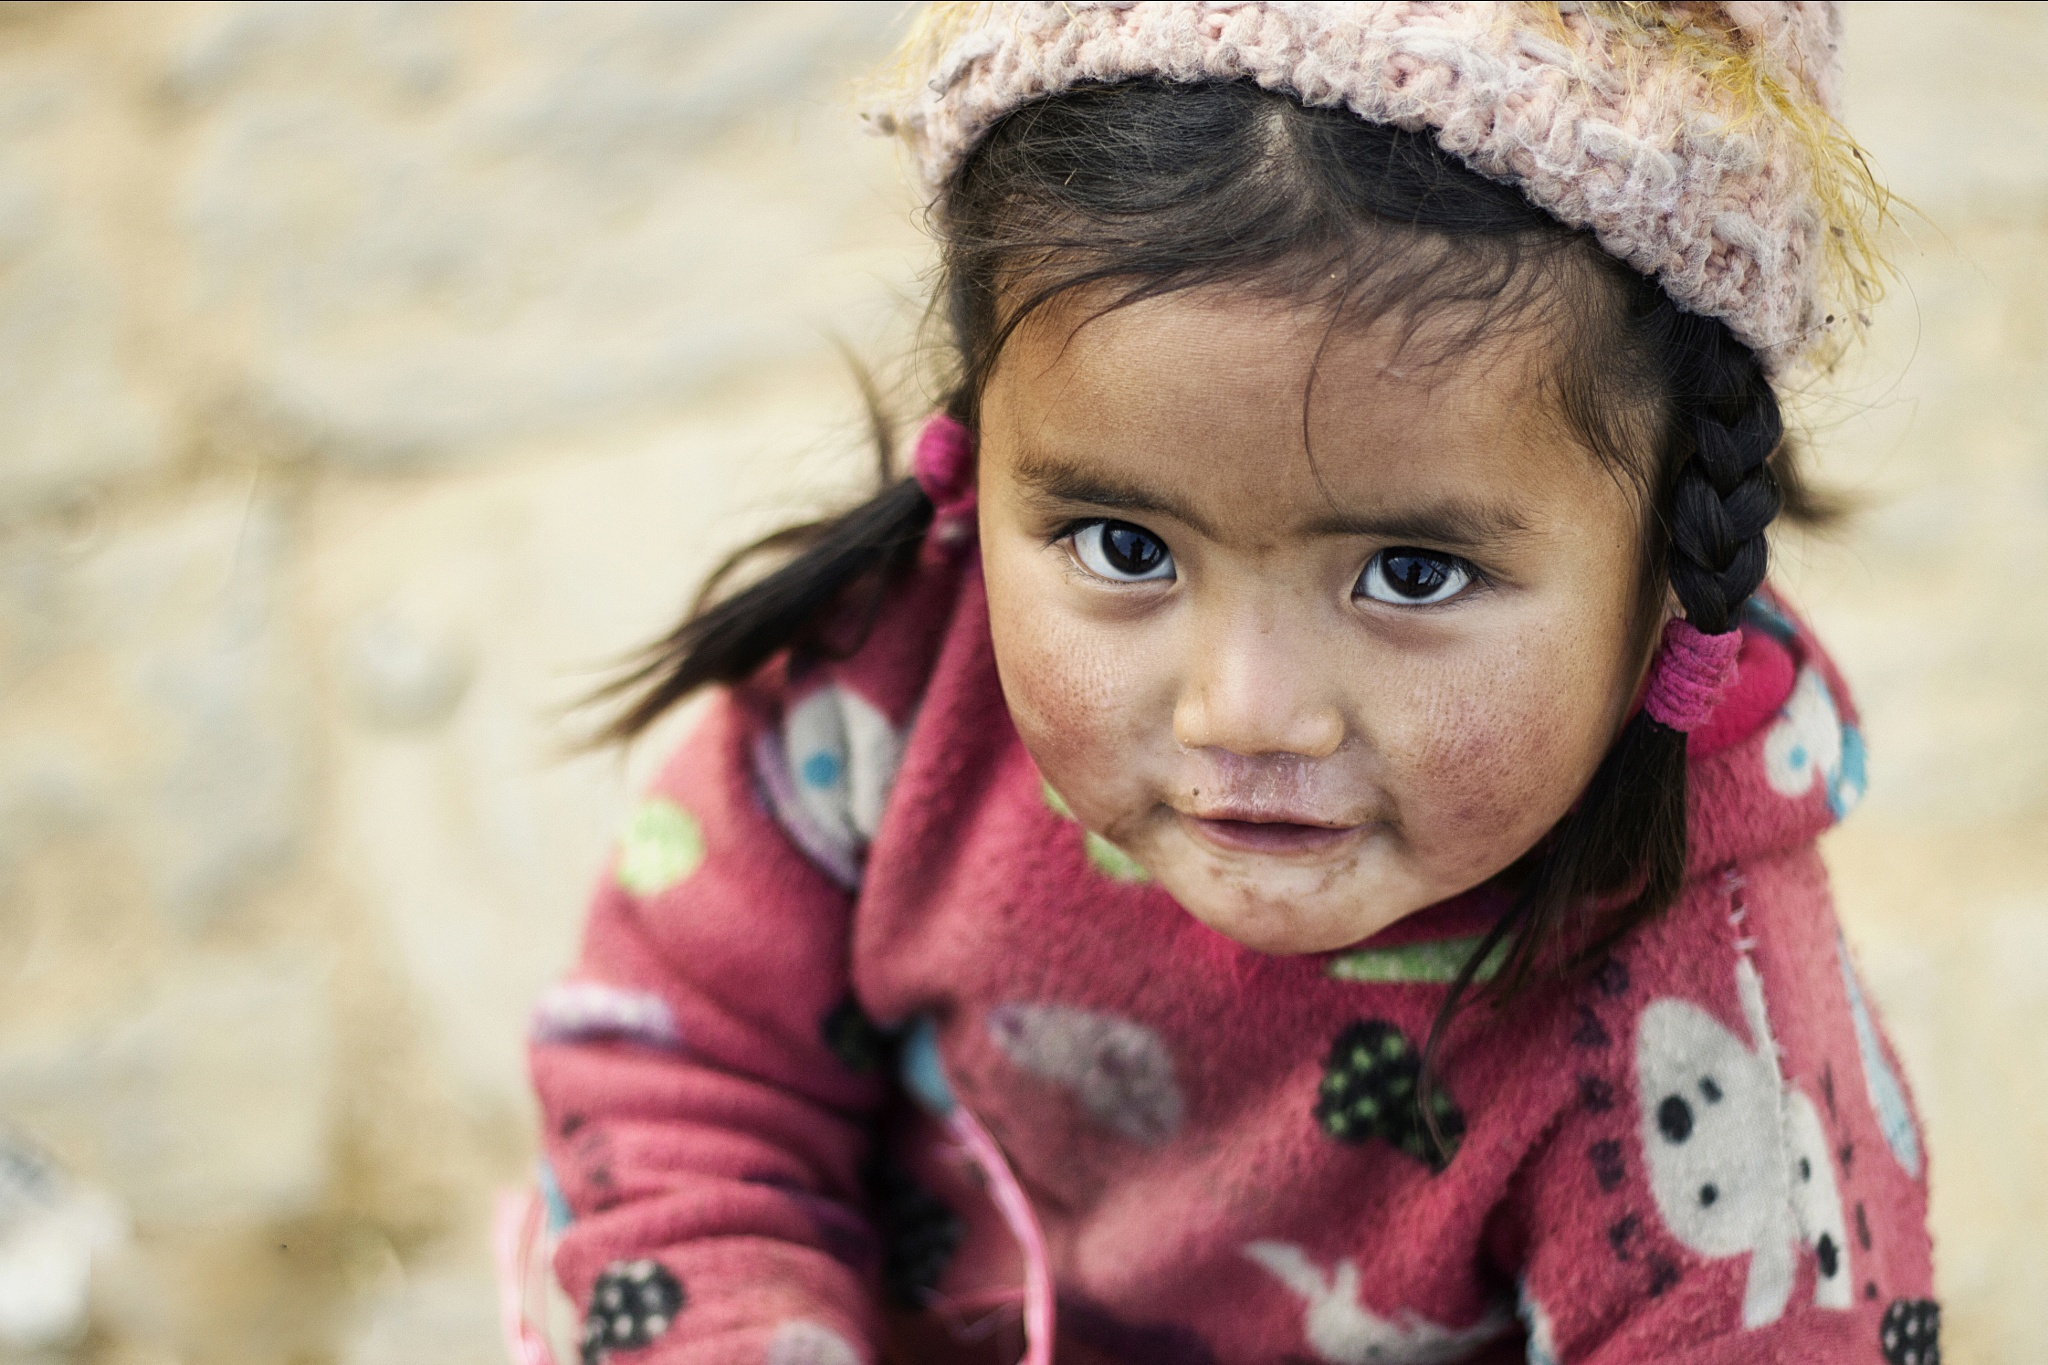 Kid Portrait by Pranishan Rajbhandari